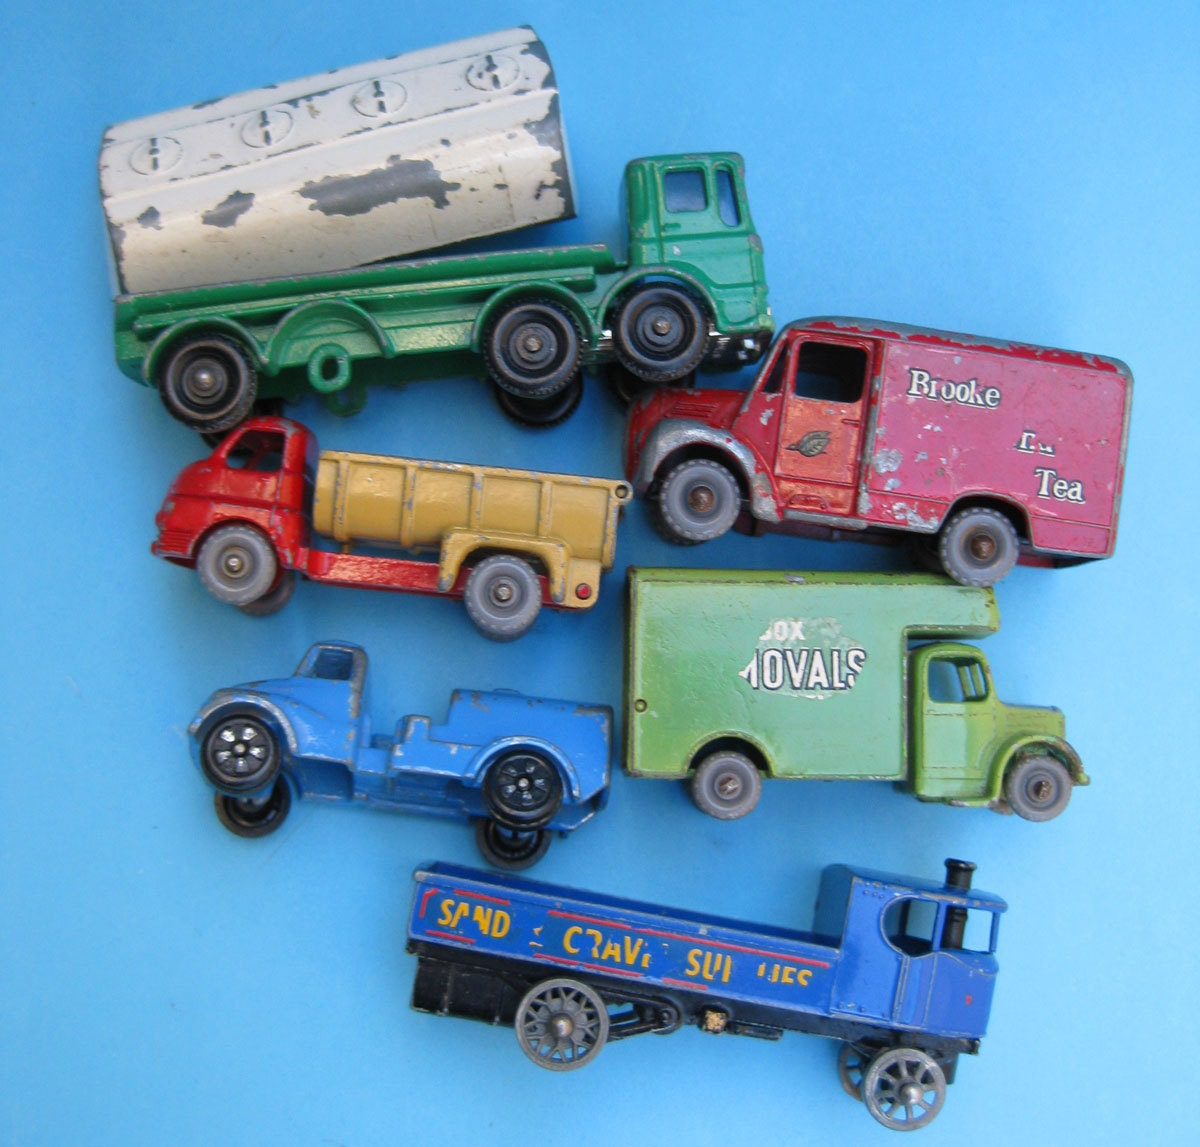 Nfl Toy Trucks : Vintage lesney die cast toy trucks miniature by